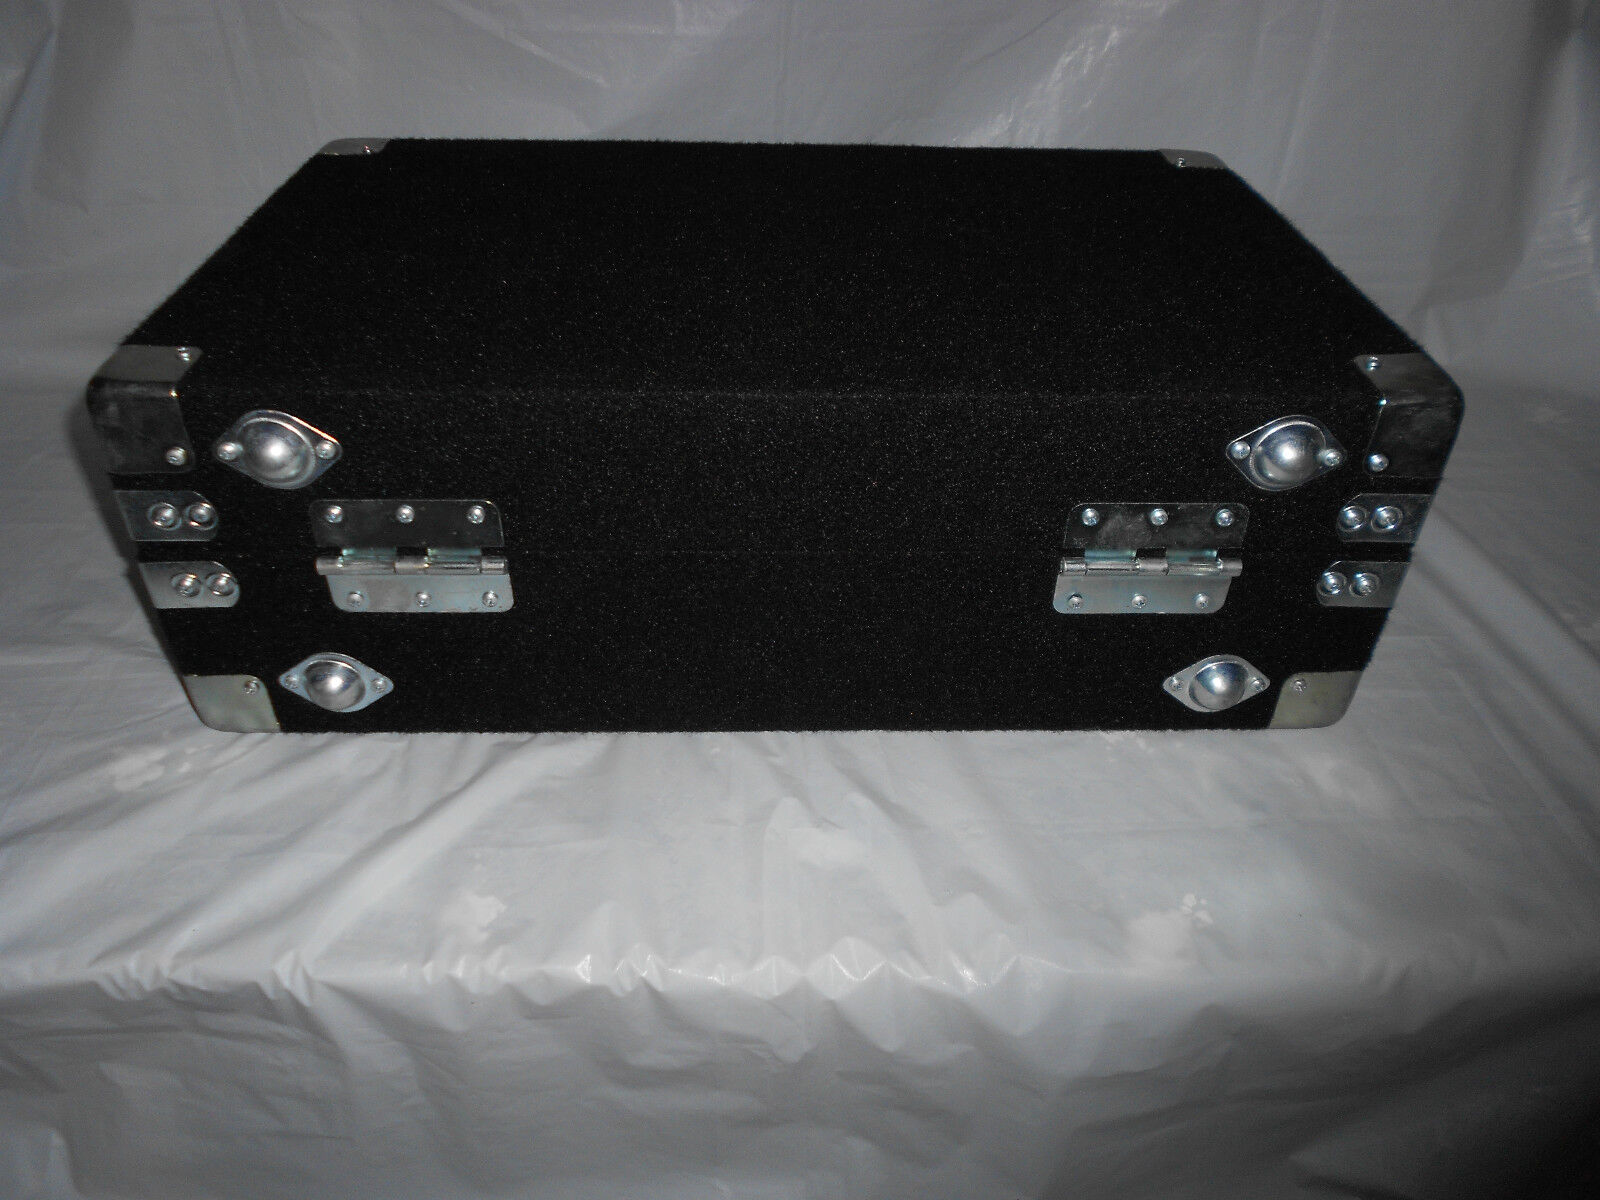 American dj hard shell cd mixer road case digital dj case new cd case mixer case